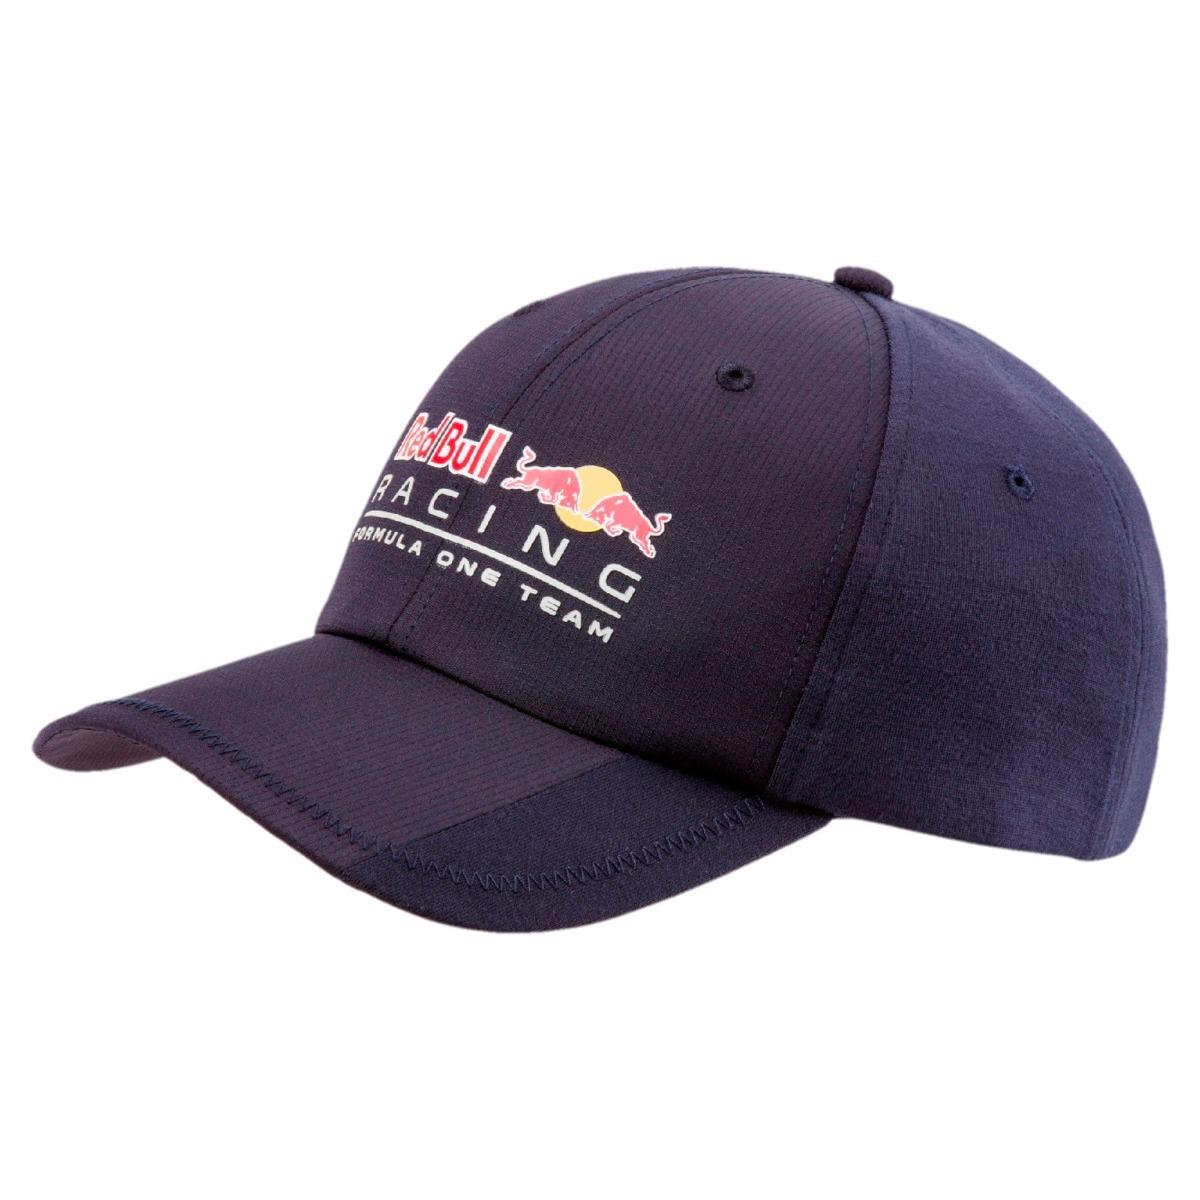 bone red bull puma racing lifestyle hat marinho. Carregando zoom. 63f77b505e2